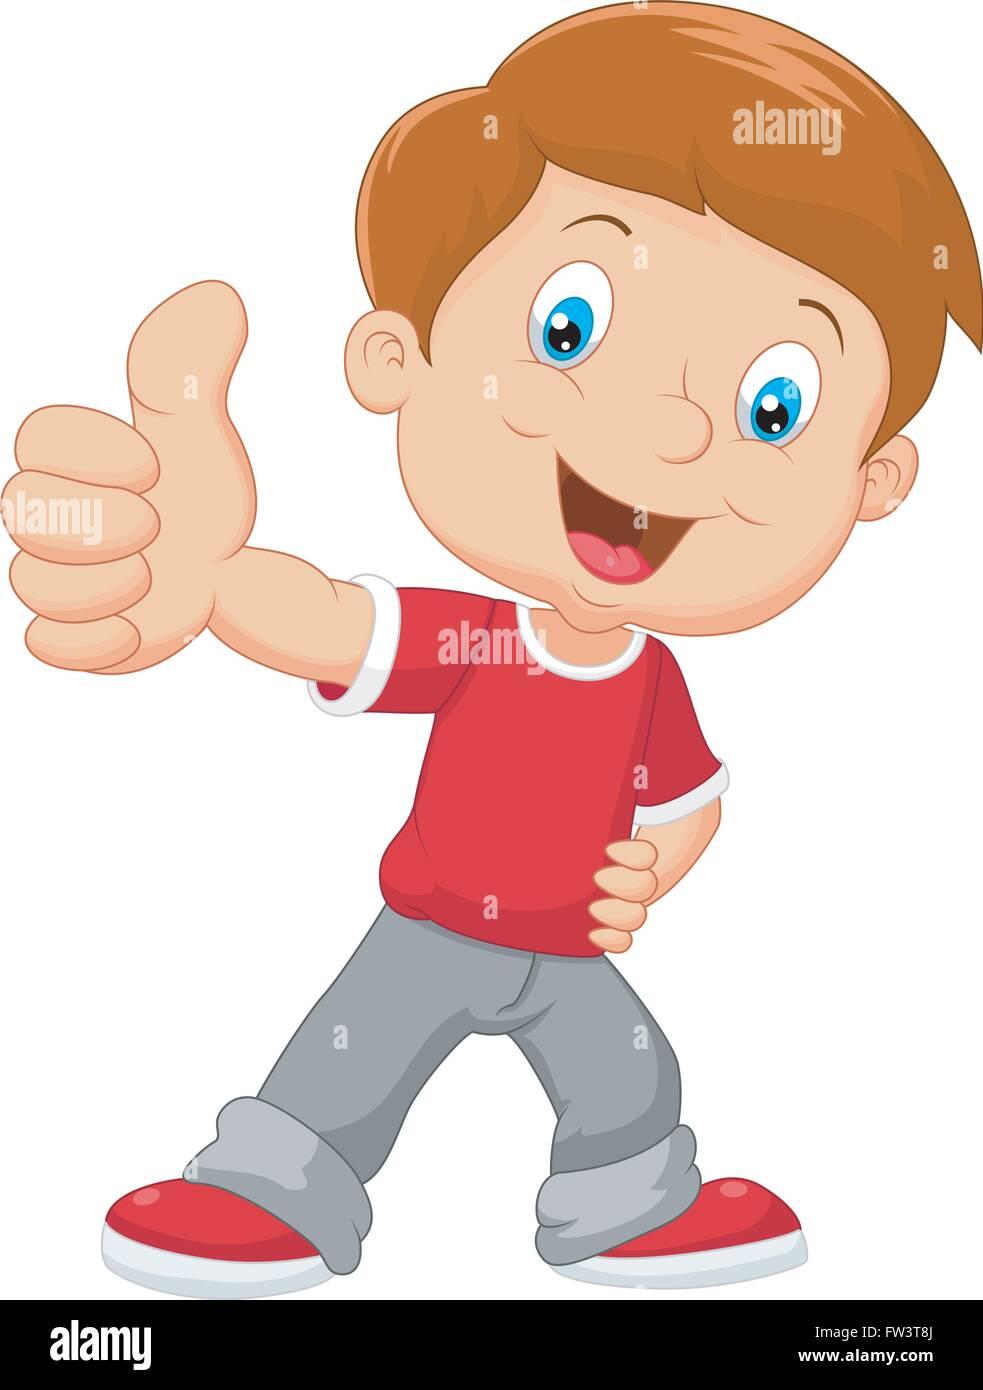 cartoon little boy giving thumbs up stock vector image art alamy https www alamy com stock photo cartoon little boy giving thumbs up 101503154 html